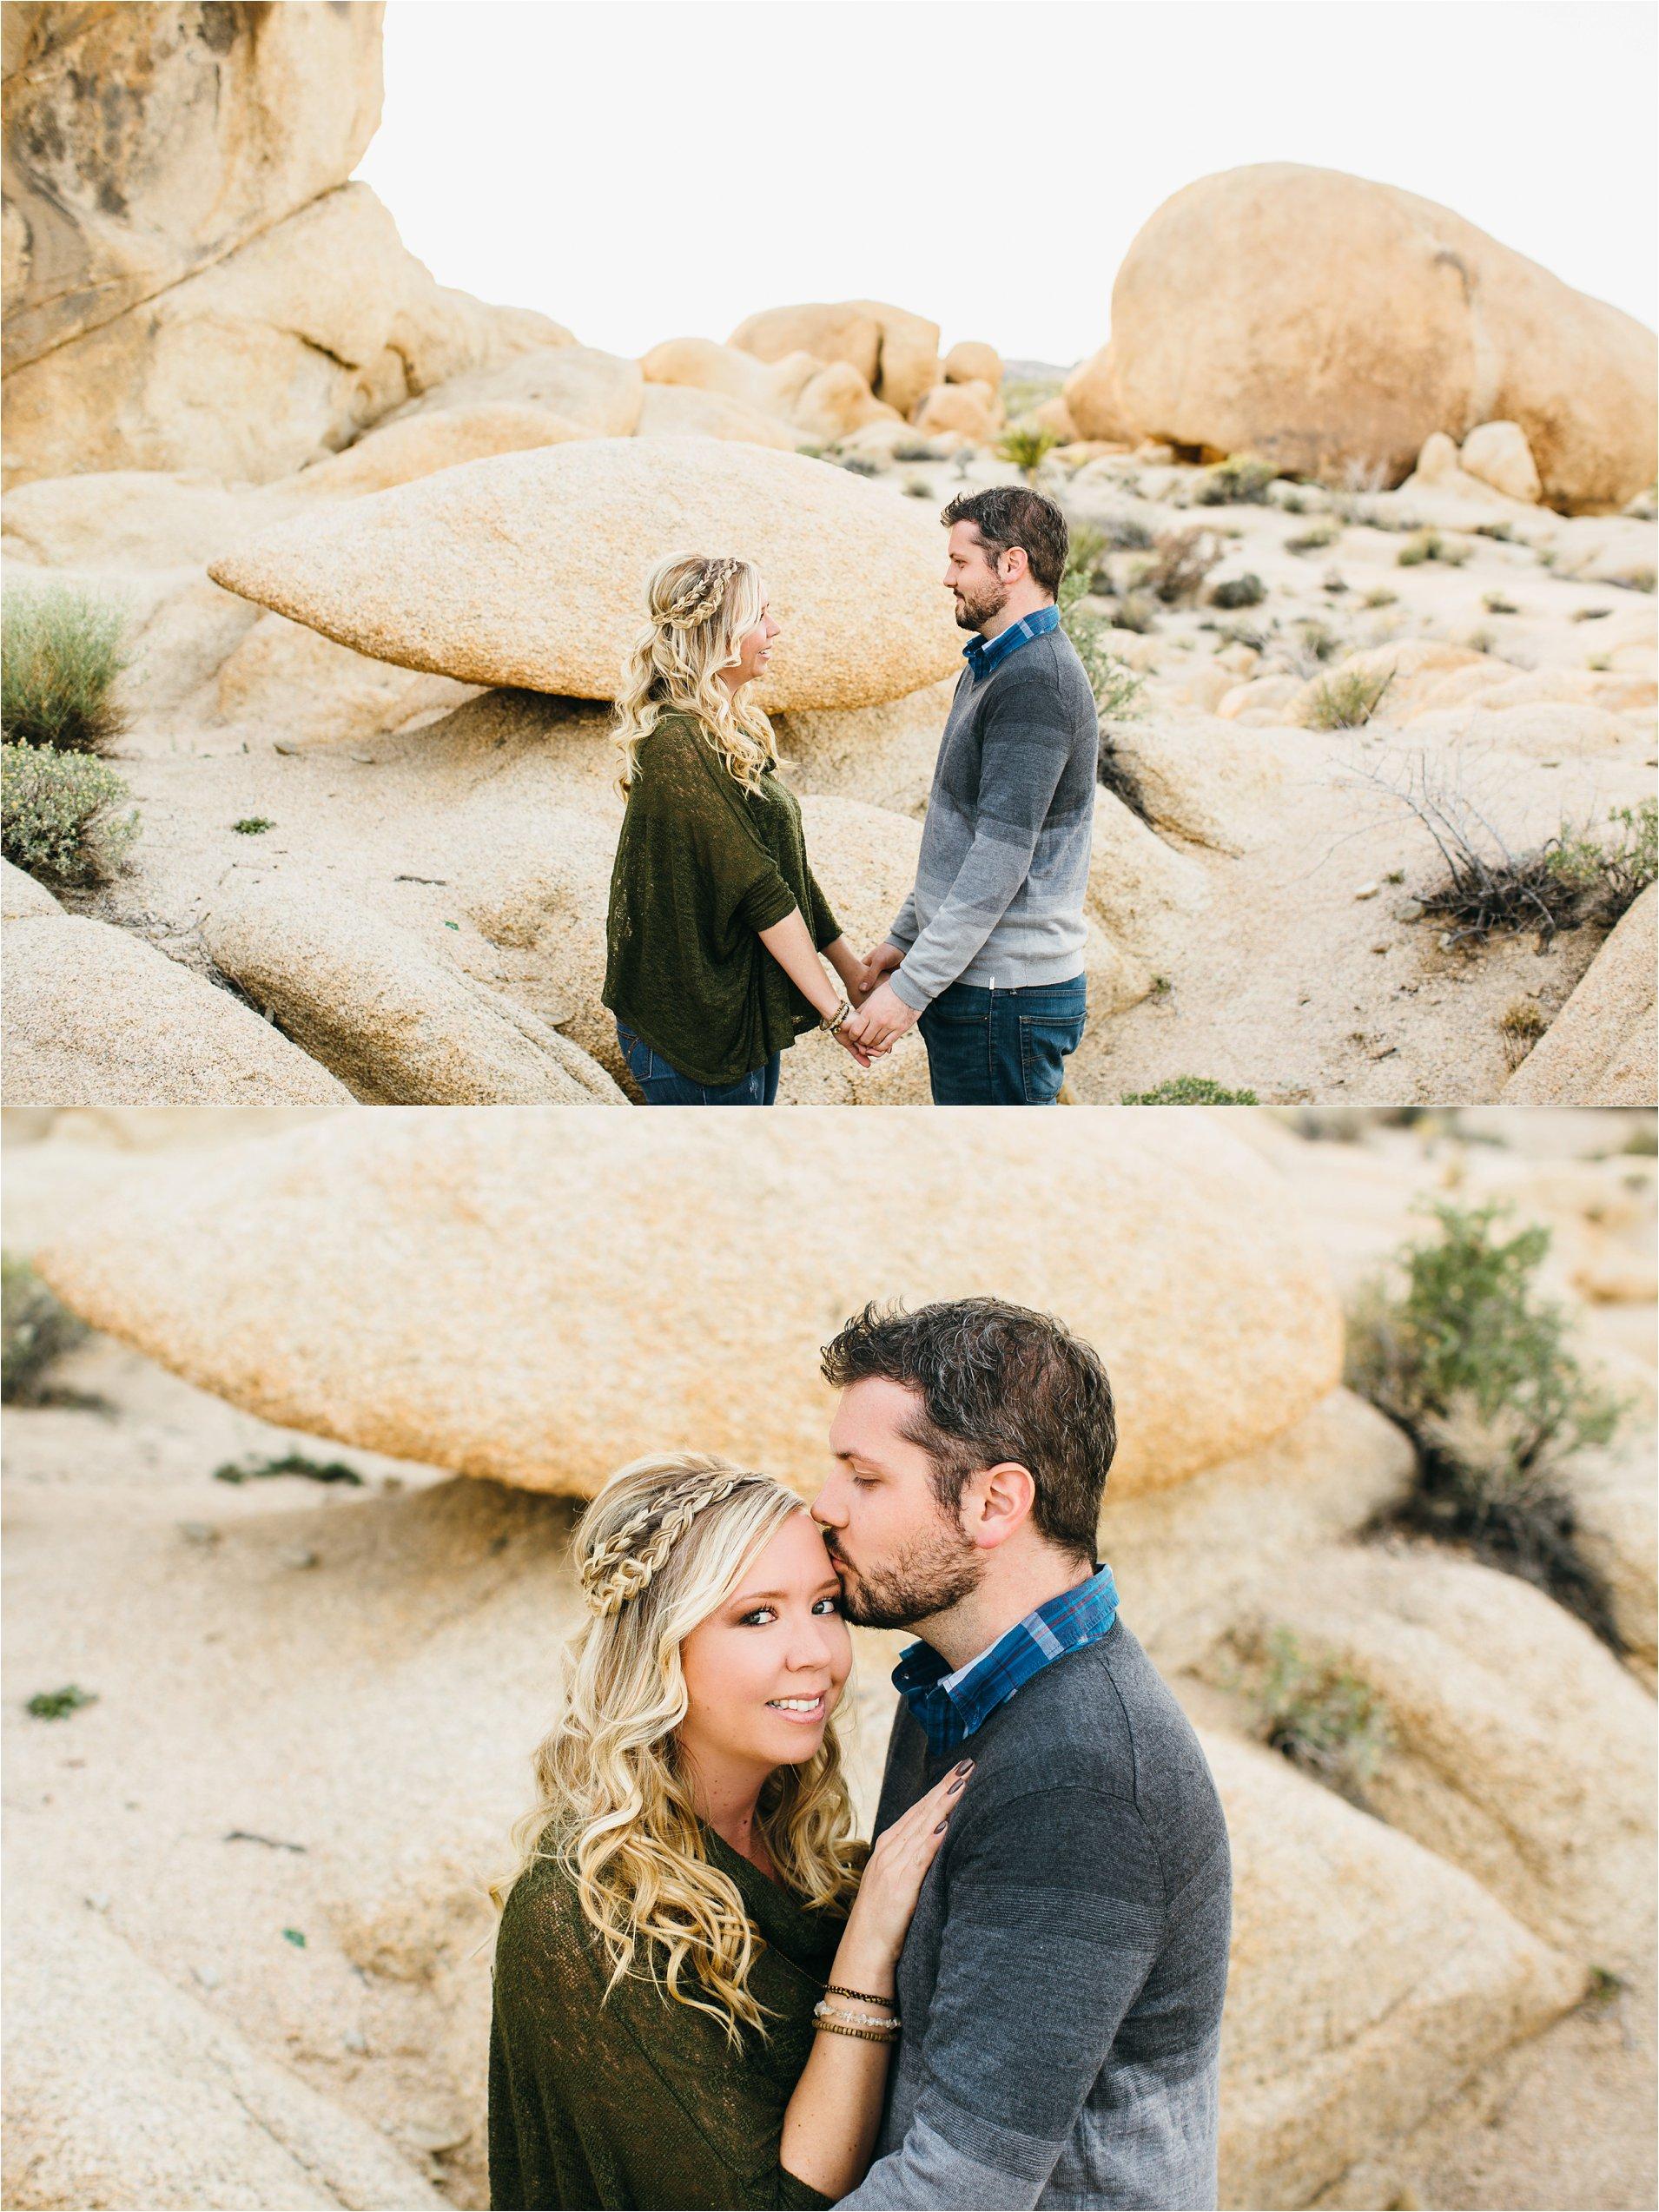 Desert Engagement Session - http://brittneyhannonphotography